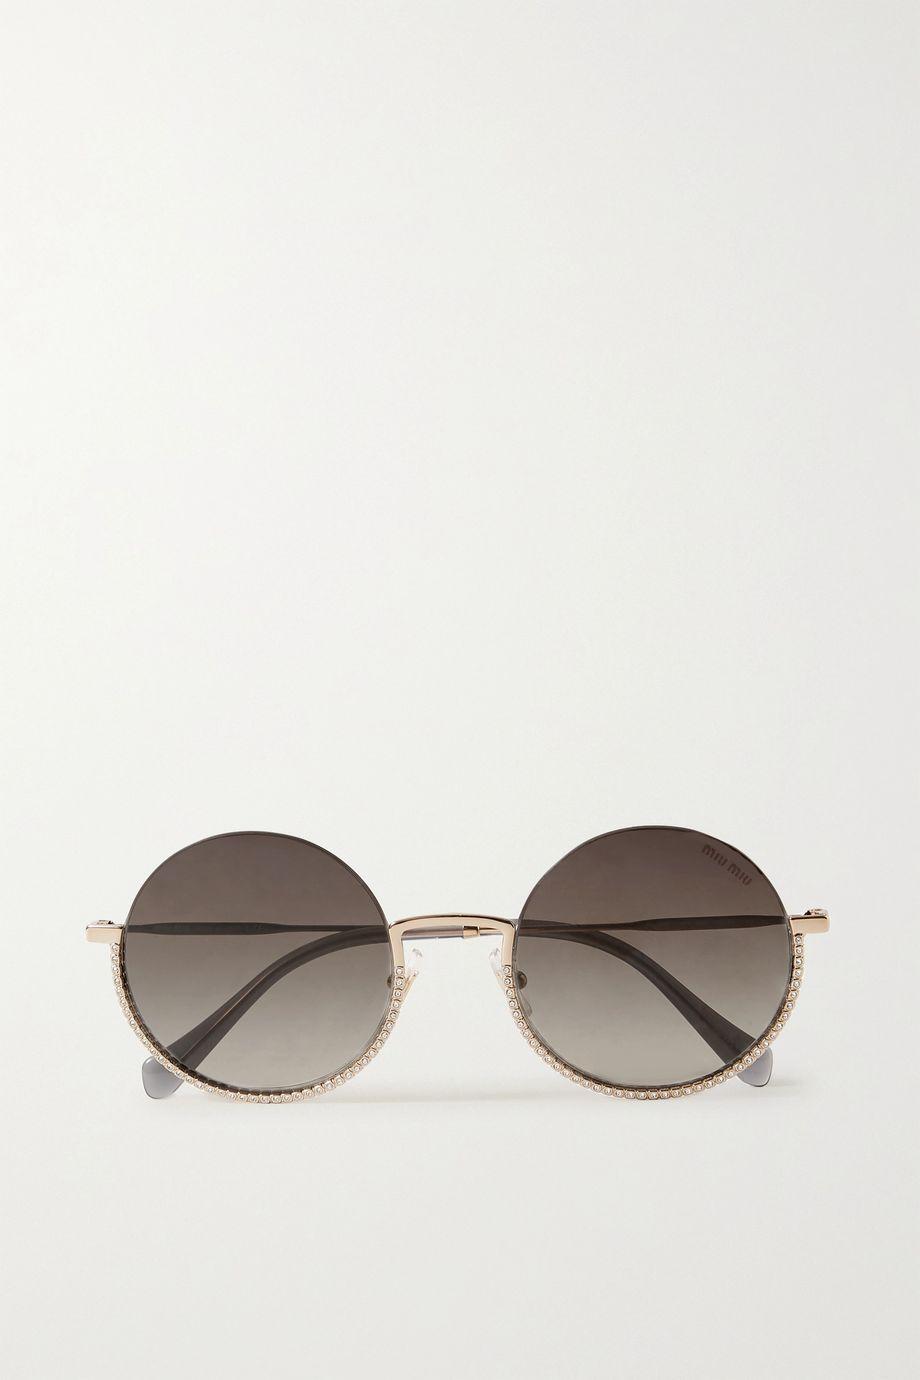 Miu Miu Eyewear Crystal-embellished round-frame gold-tone sunglasses